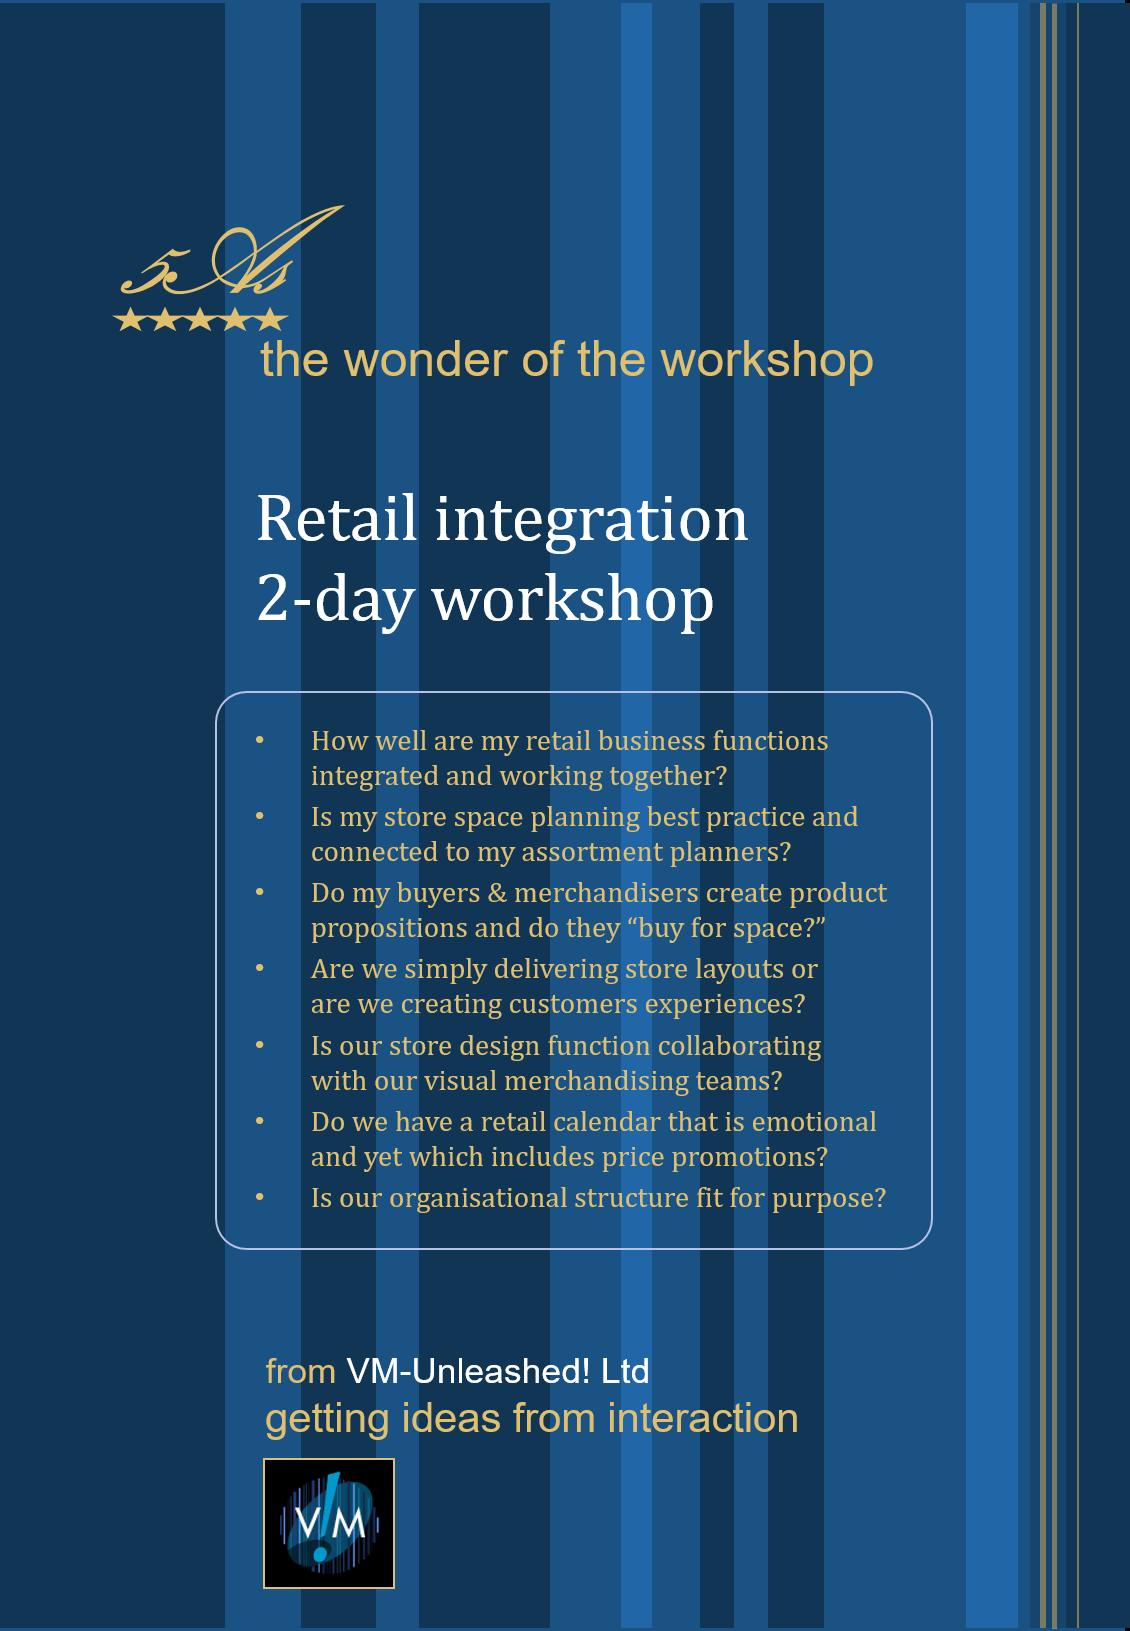 vm-unleashed-retail-workshop-retail-integration